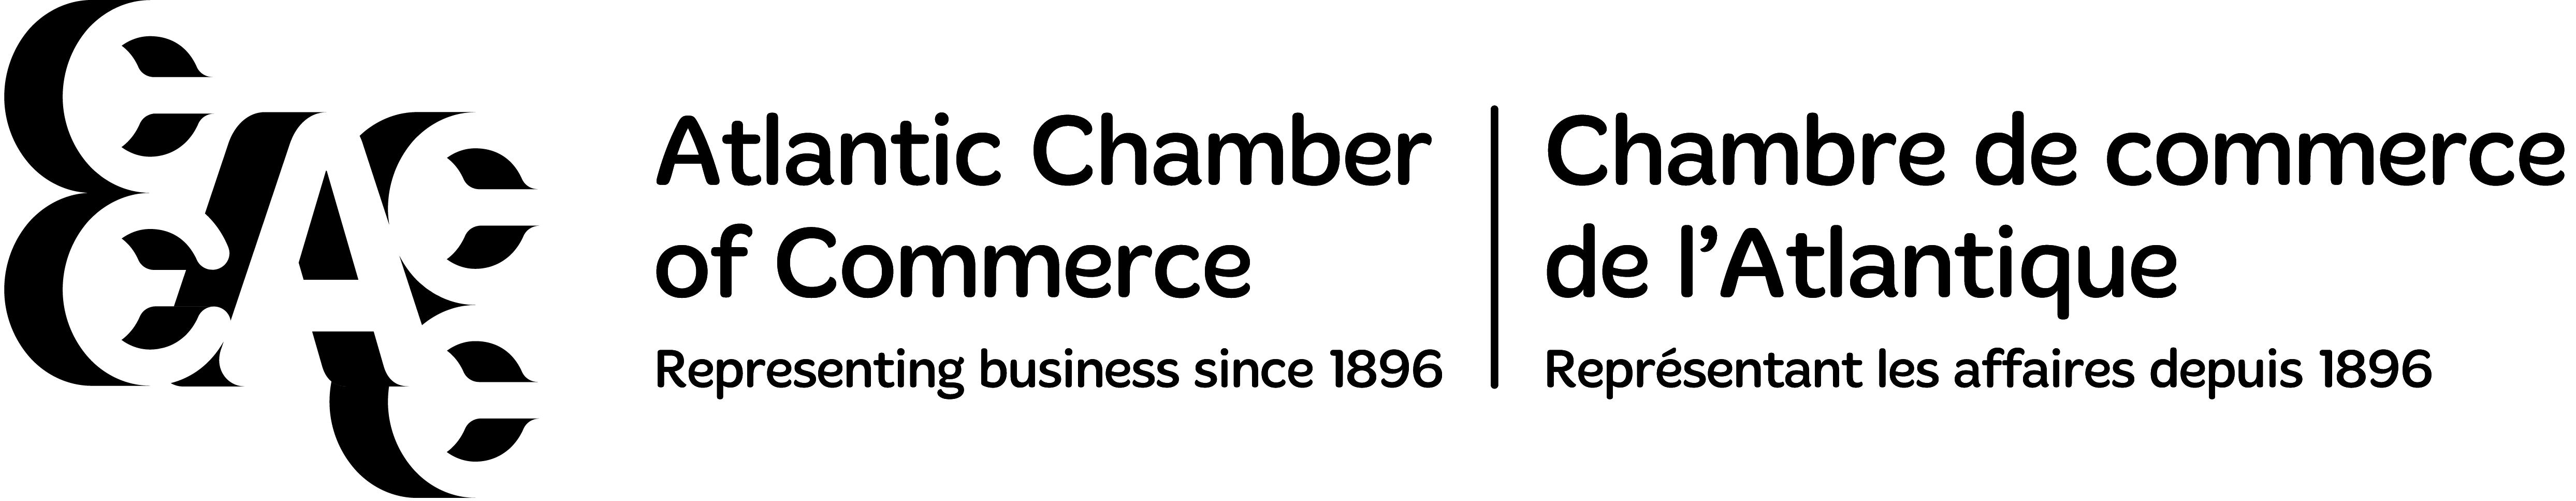 Atlantic Chamber logo